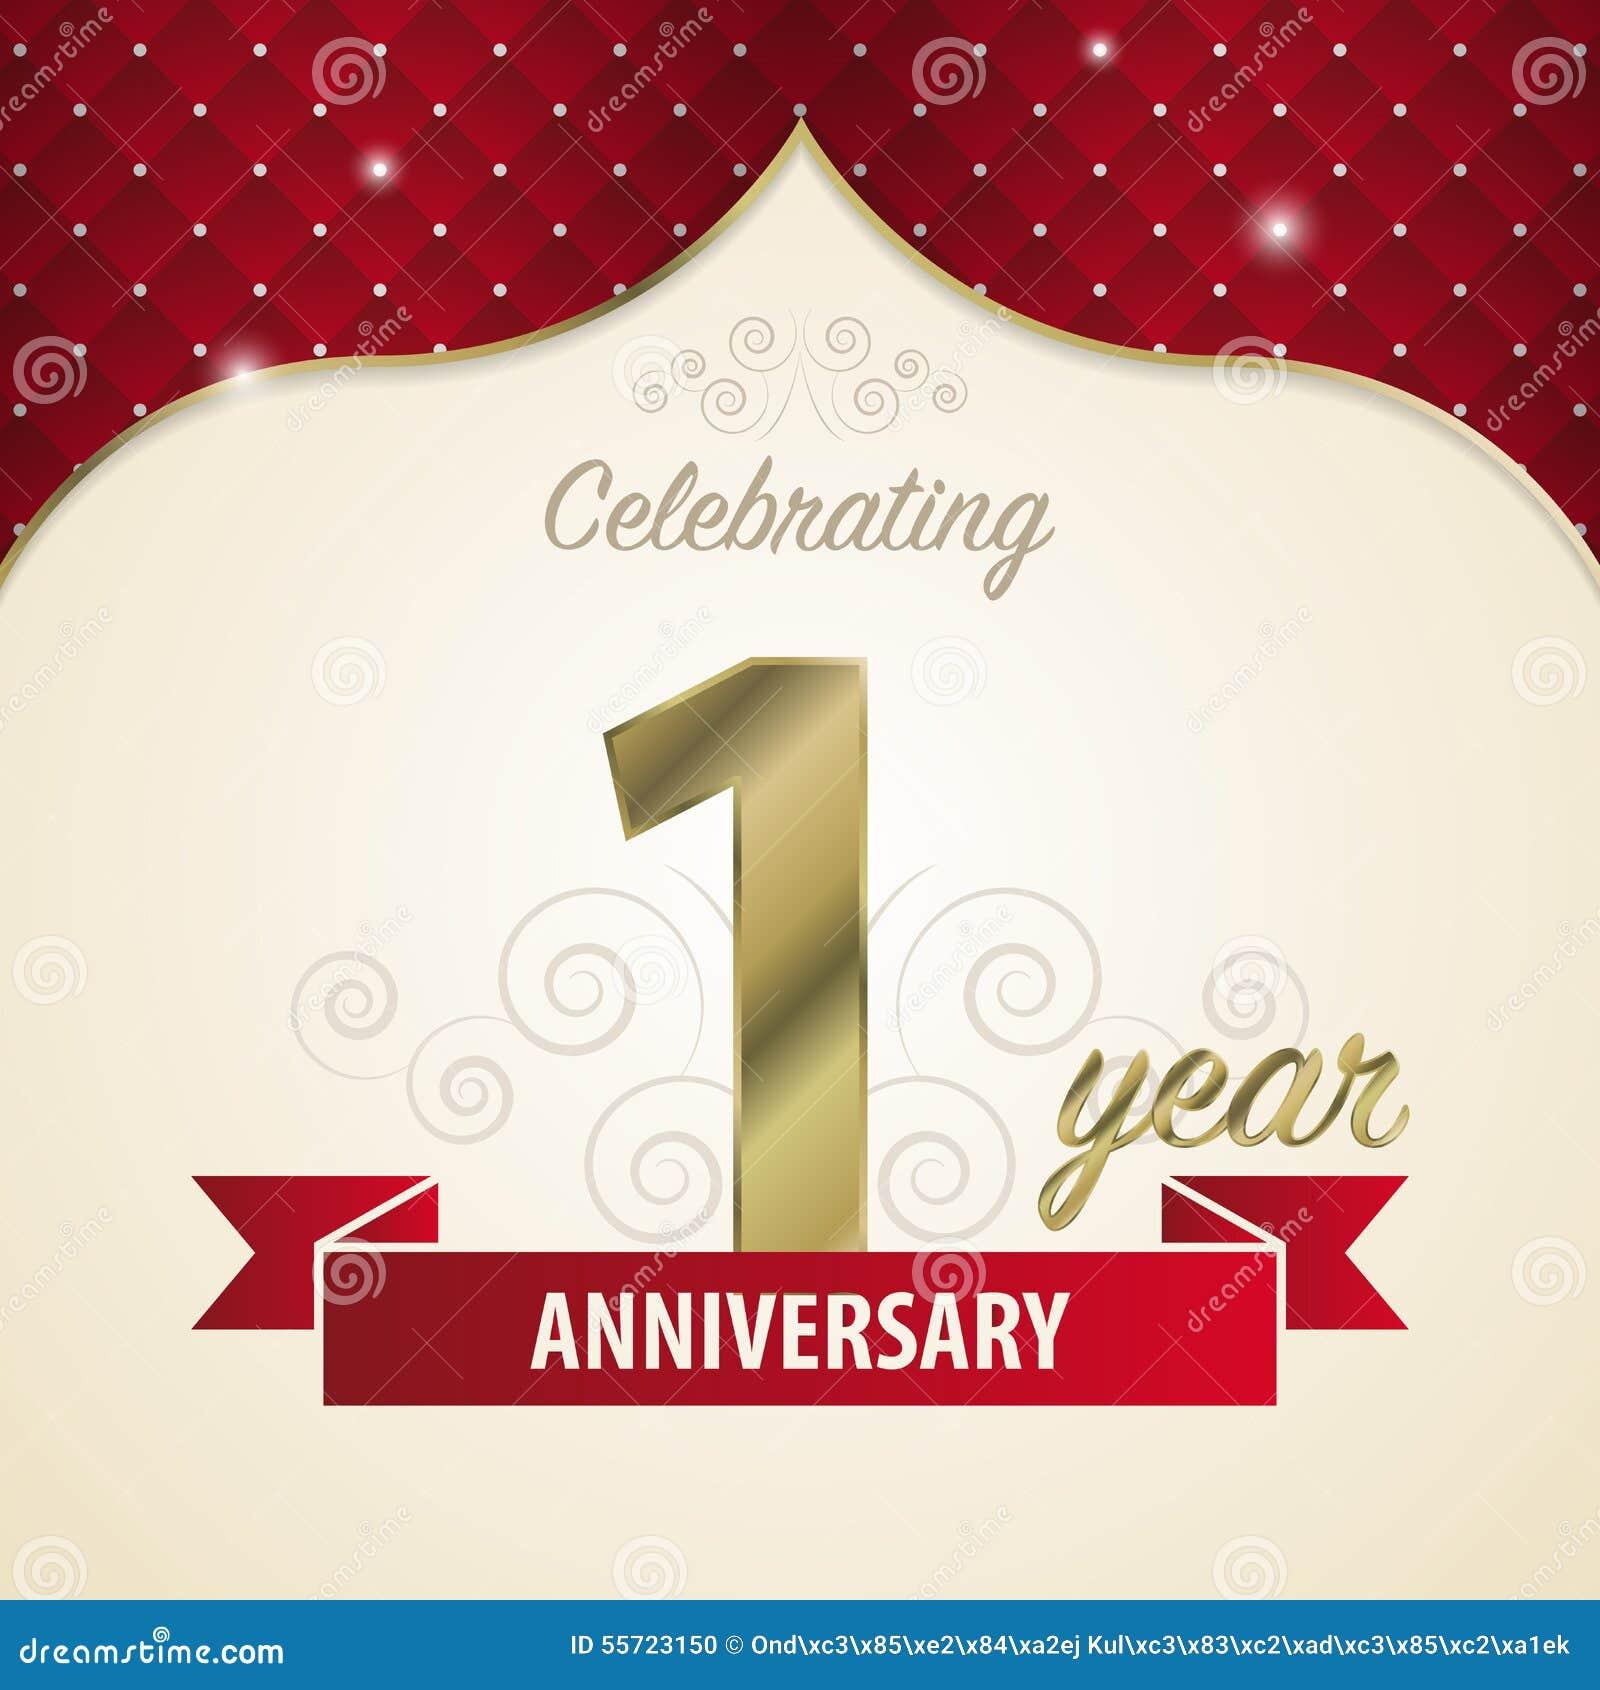 1 Year Anniversary Celebration Golden Style Vector Stock